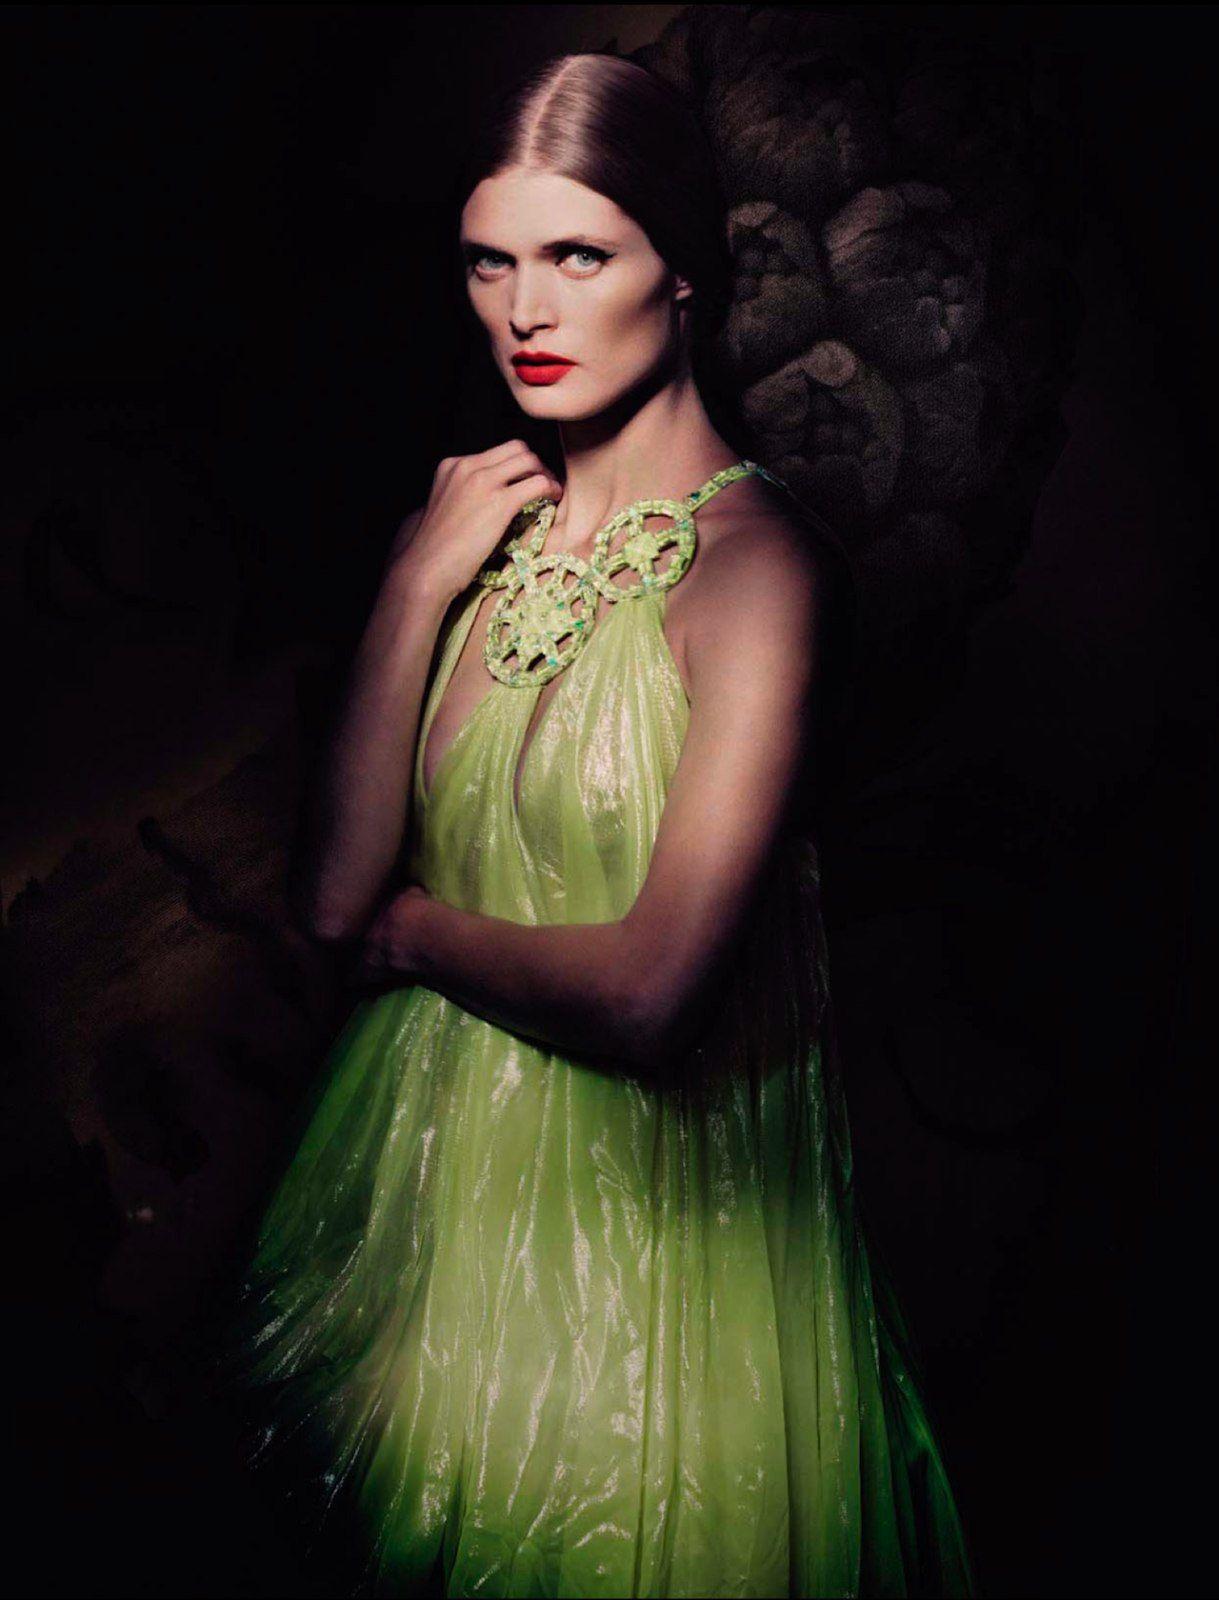 Małgosia Bela by Paolo Roversi for Vogue Italia March 2013